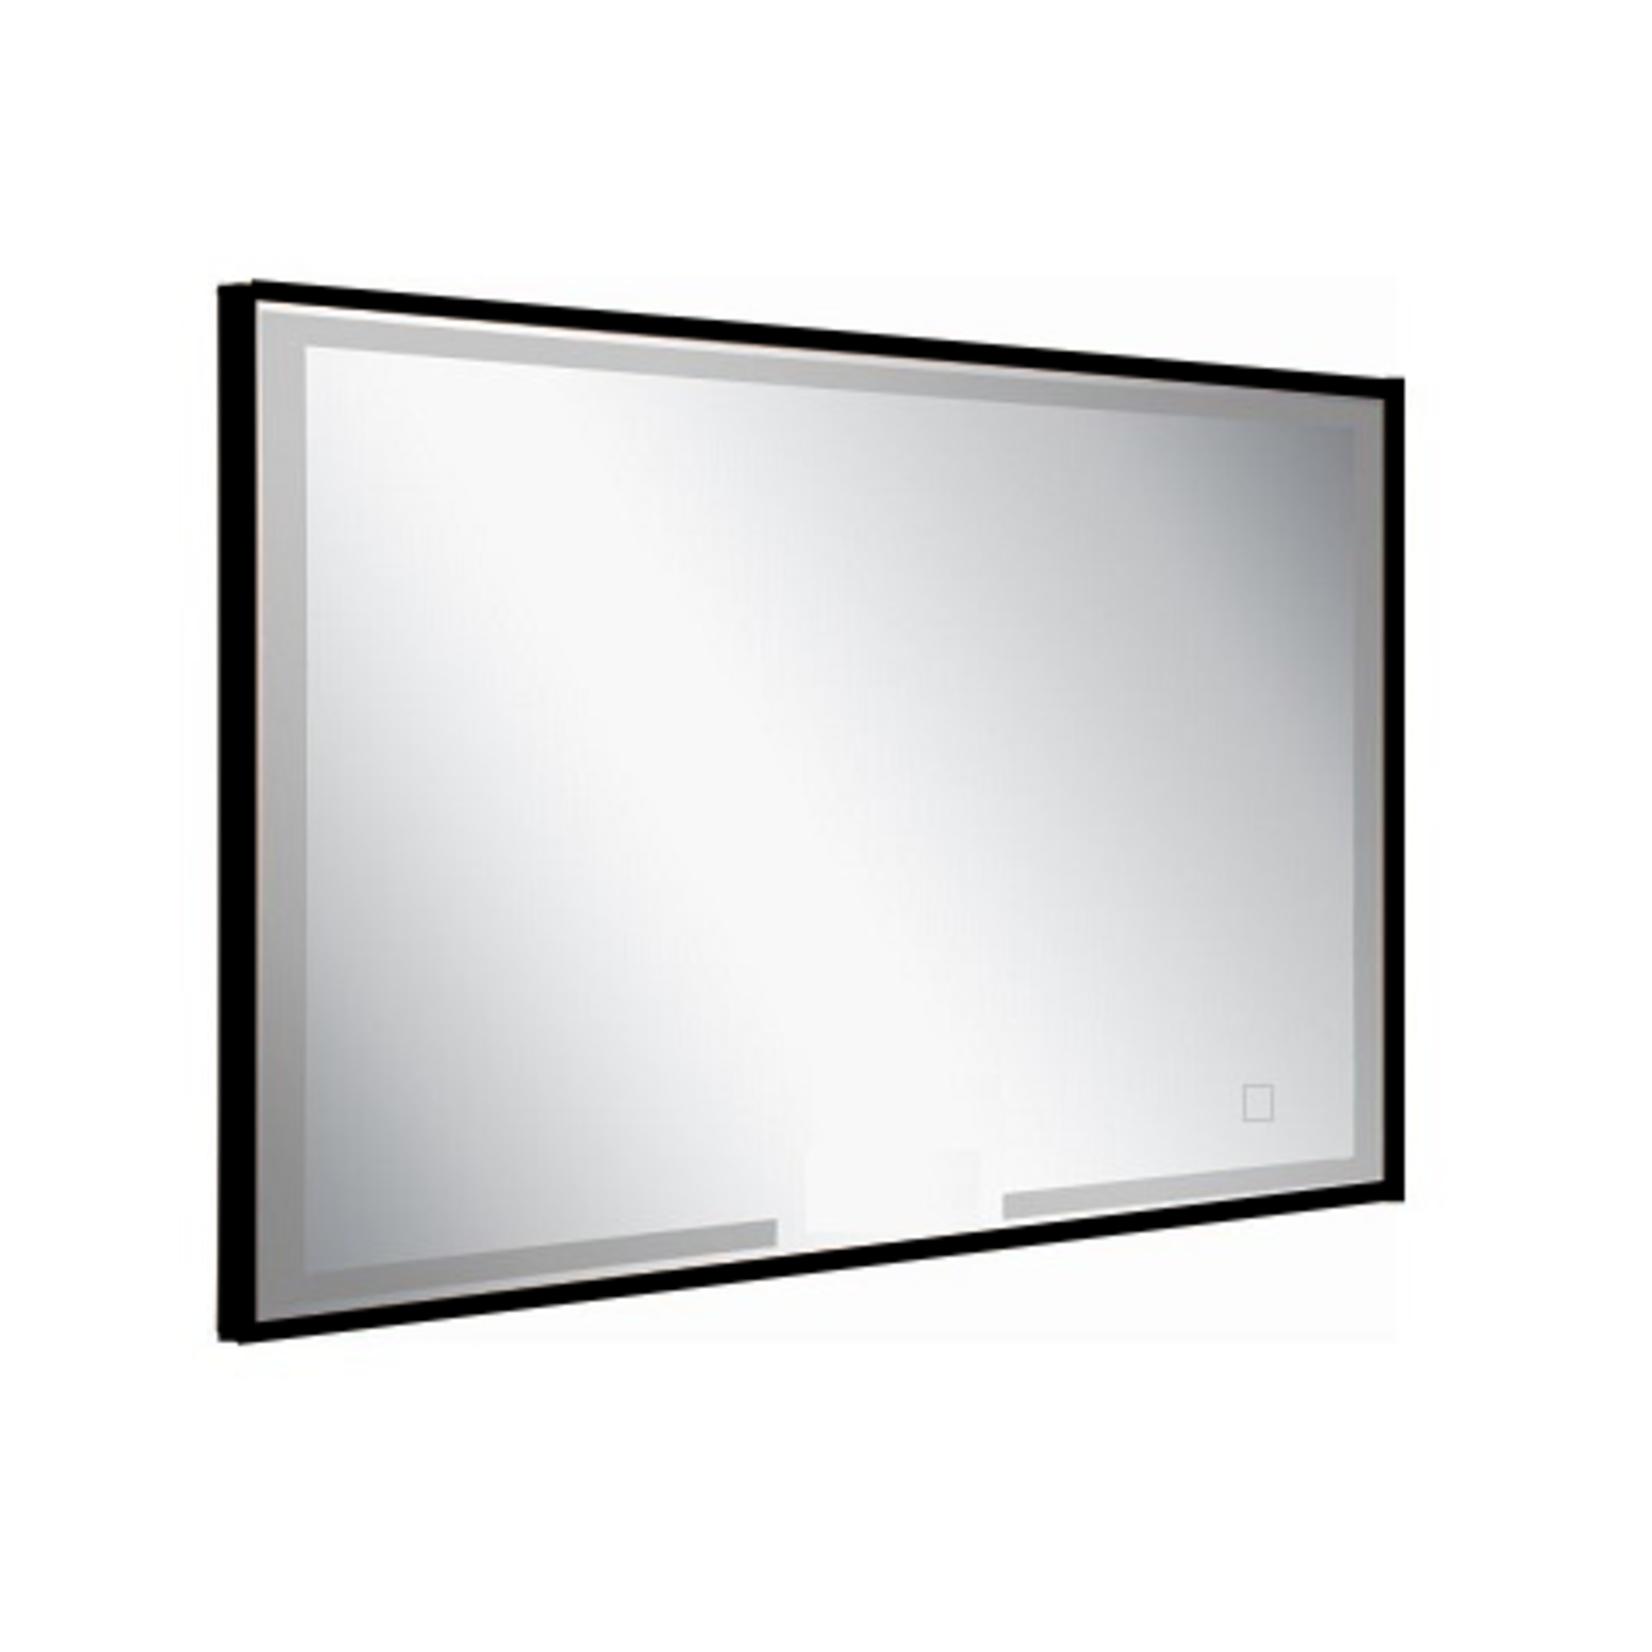 Rectangular LED mirror with black borders